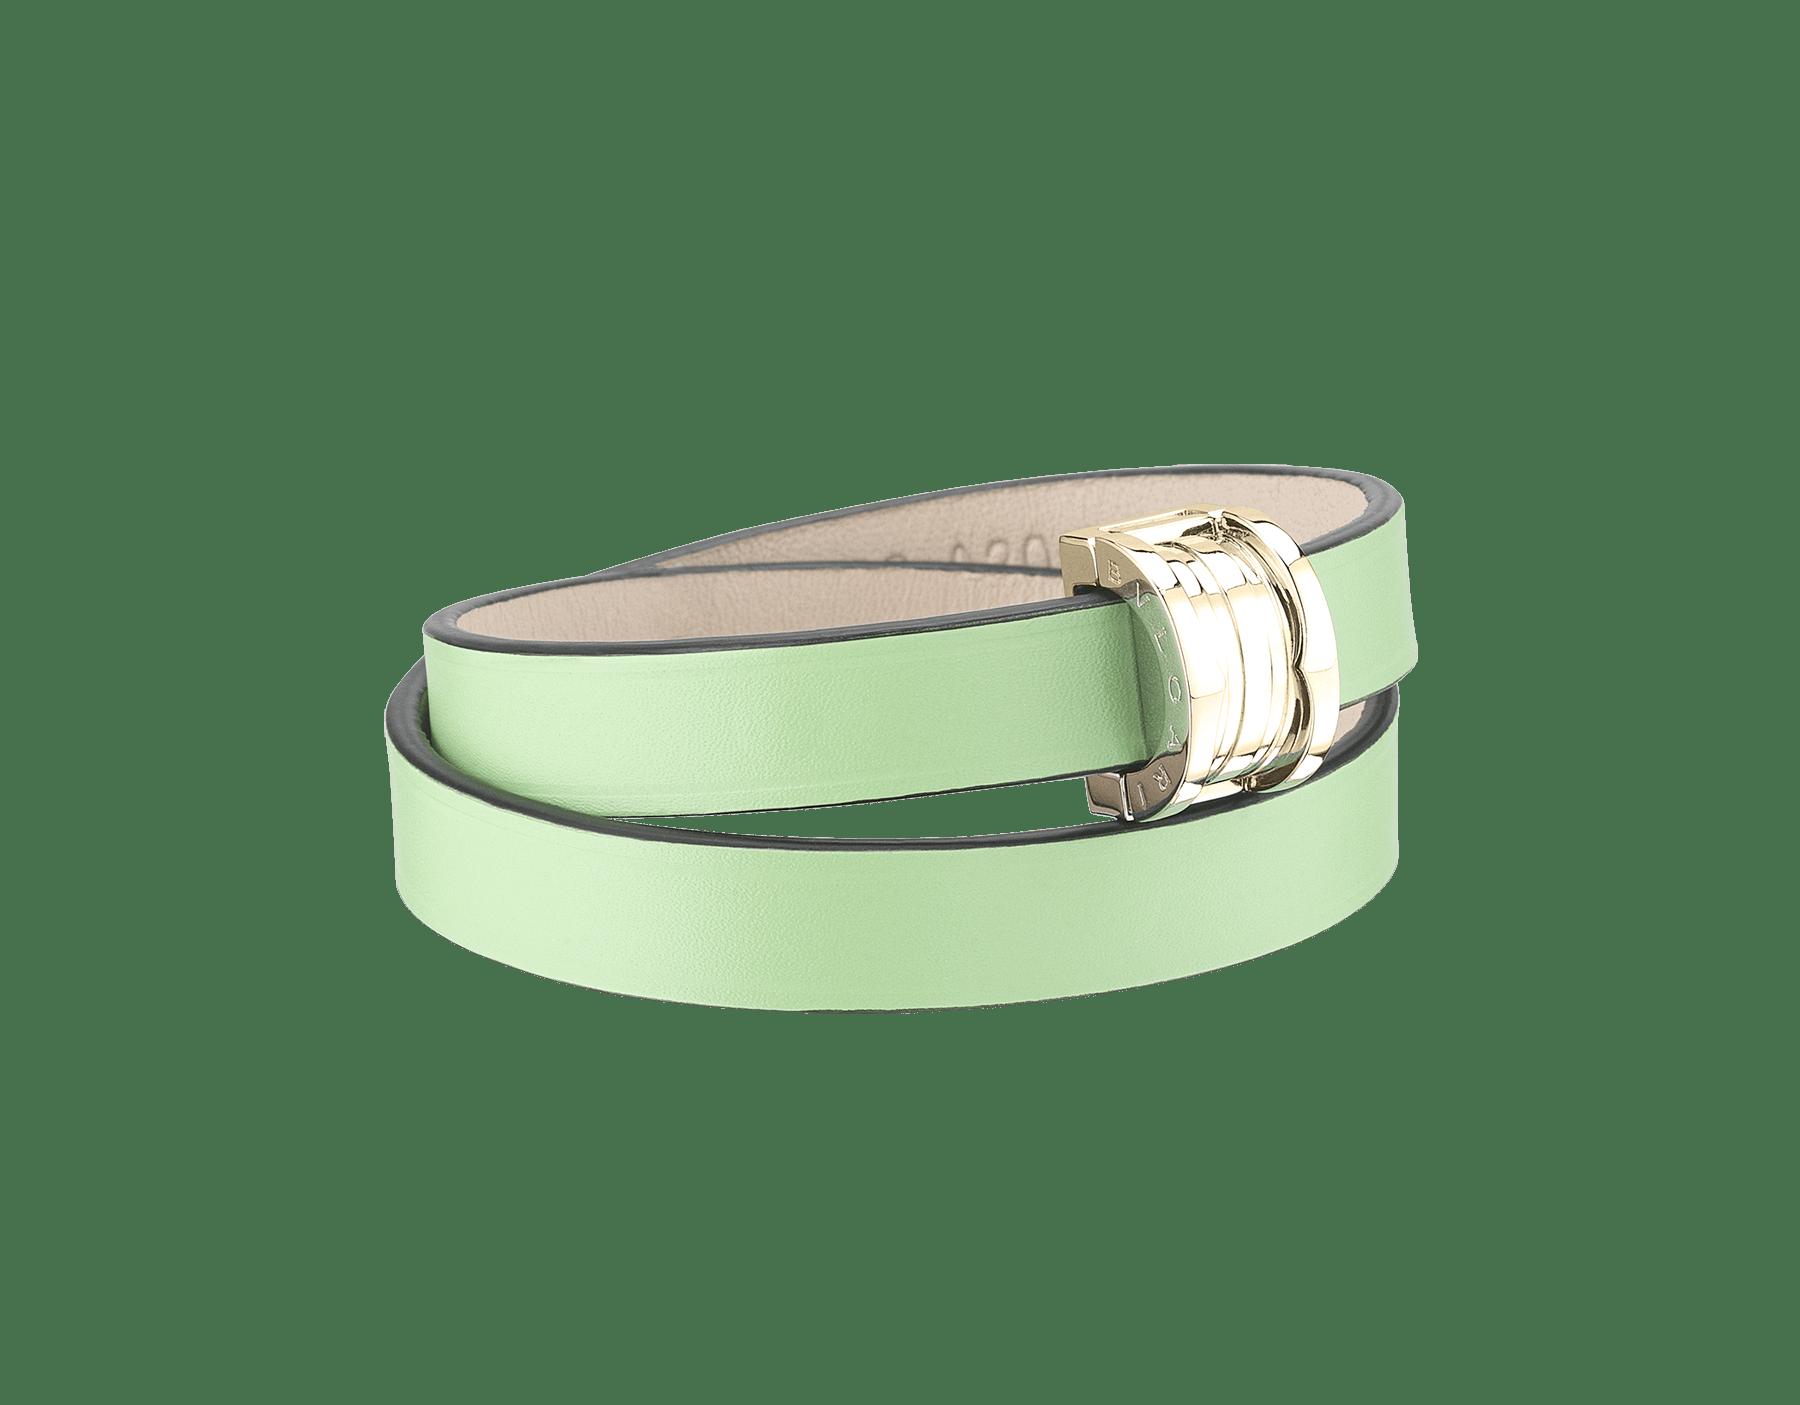 Браслет в два витка Bvlgari Bvlgari, кожа теленка мятно-зеленого цвета, застежка-кнопка B.Zero1 из латуни с покрытием из светлого золота. BZERO1-CL-M image 1